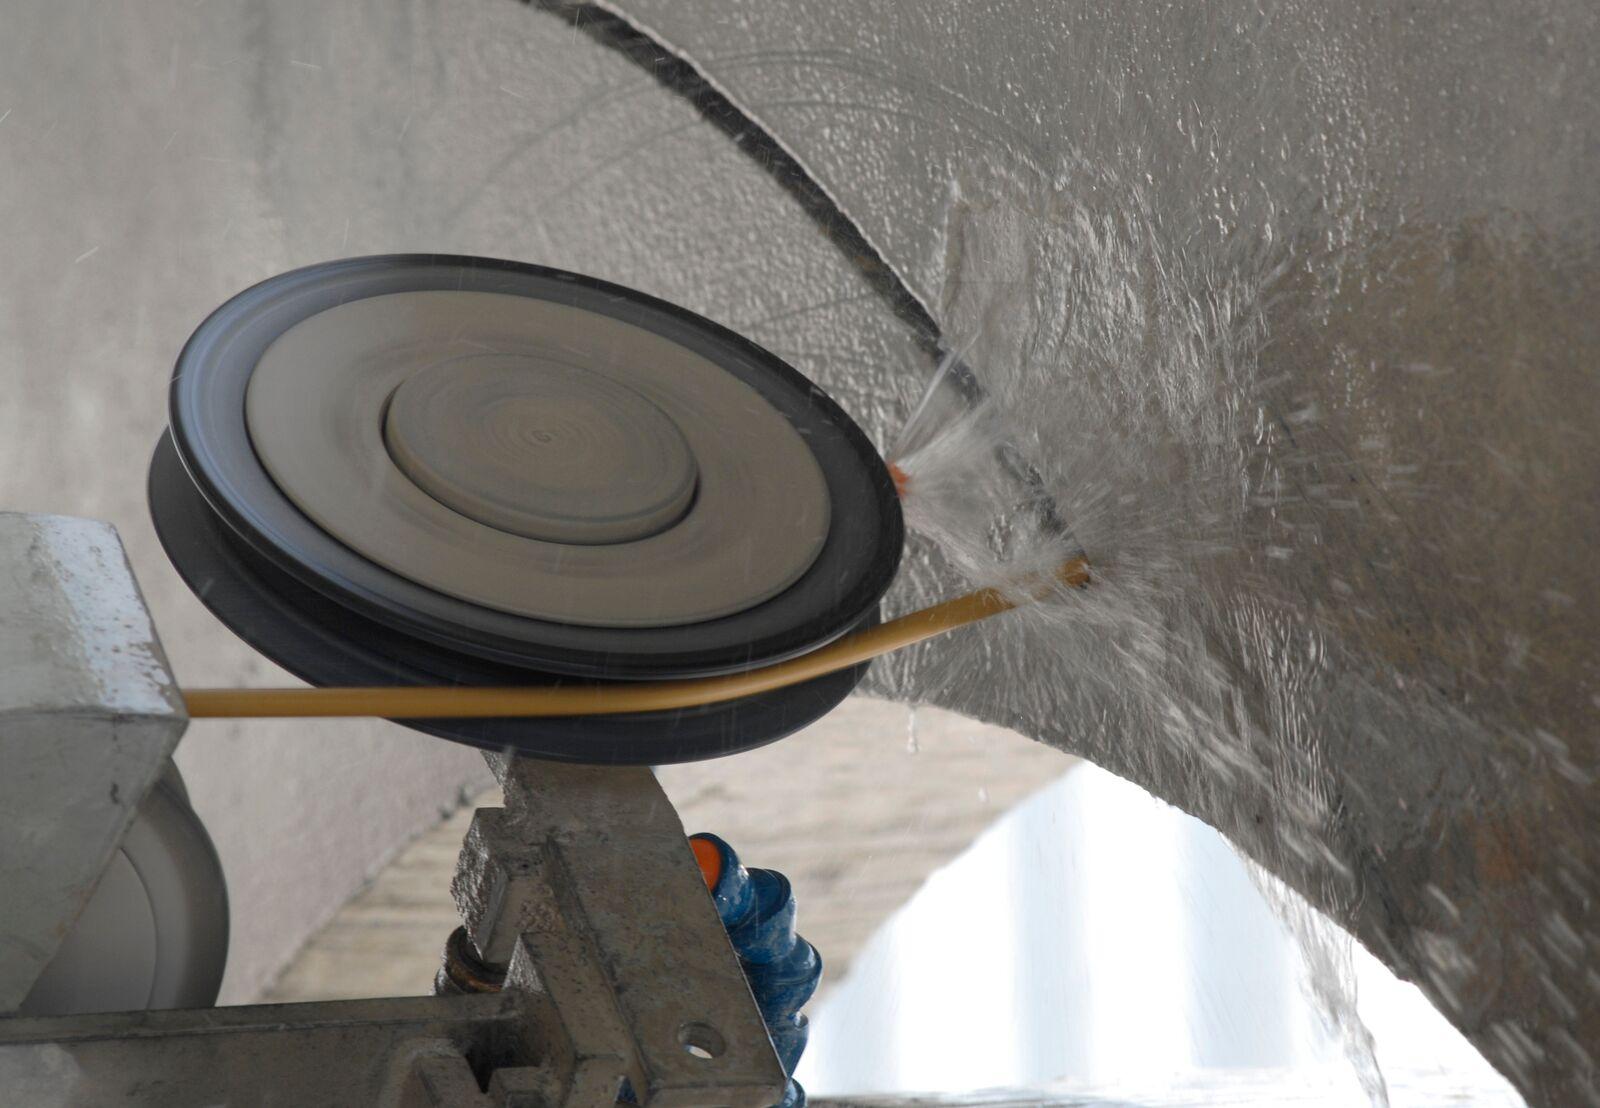 Castle Amp Pryor Ltd Airport Concrete Diamond Drilling And